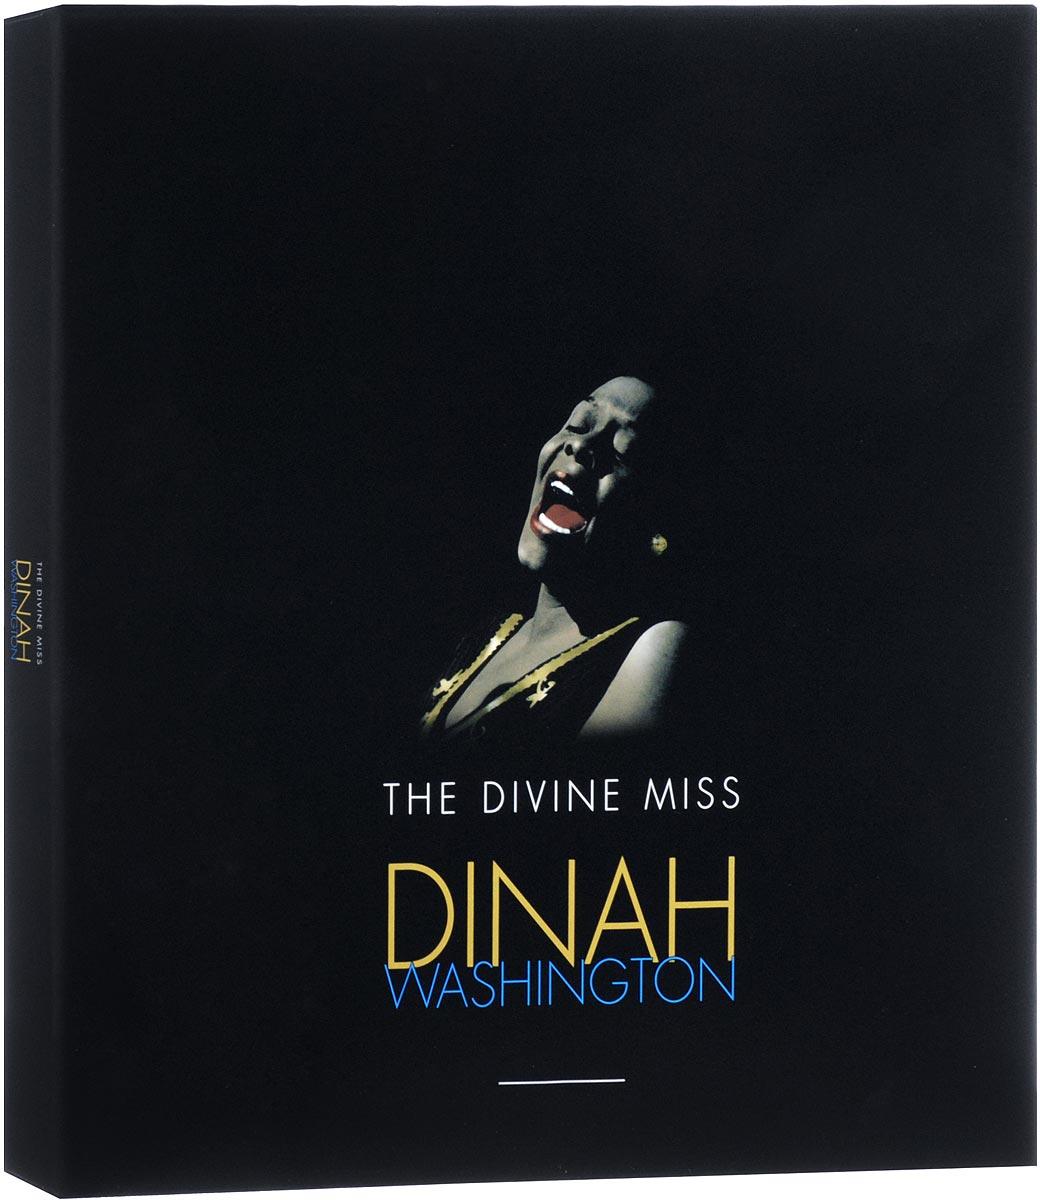 Дайна Вашингтон Dinah Washington. The Divine Miss Dinah Washington (5 LP) бэби вашингтон baby washington the sue singles